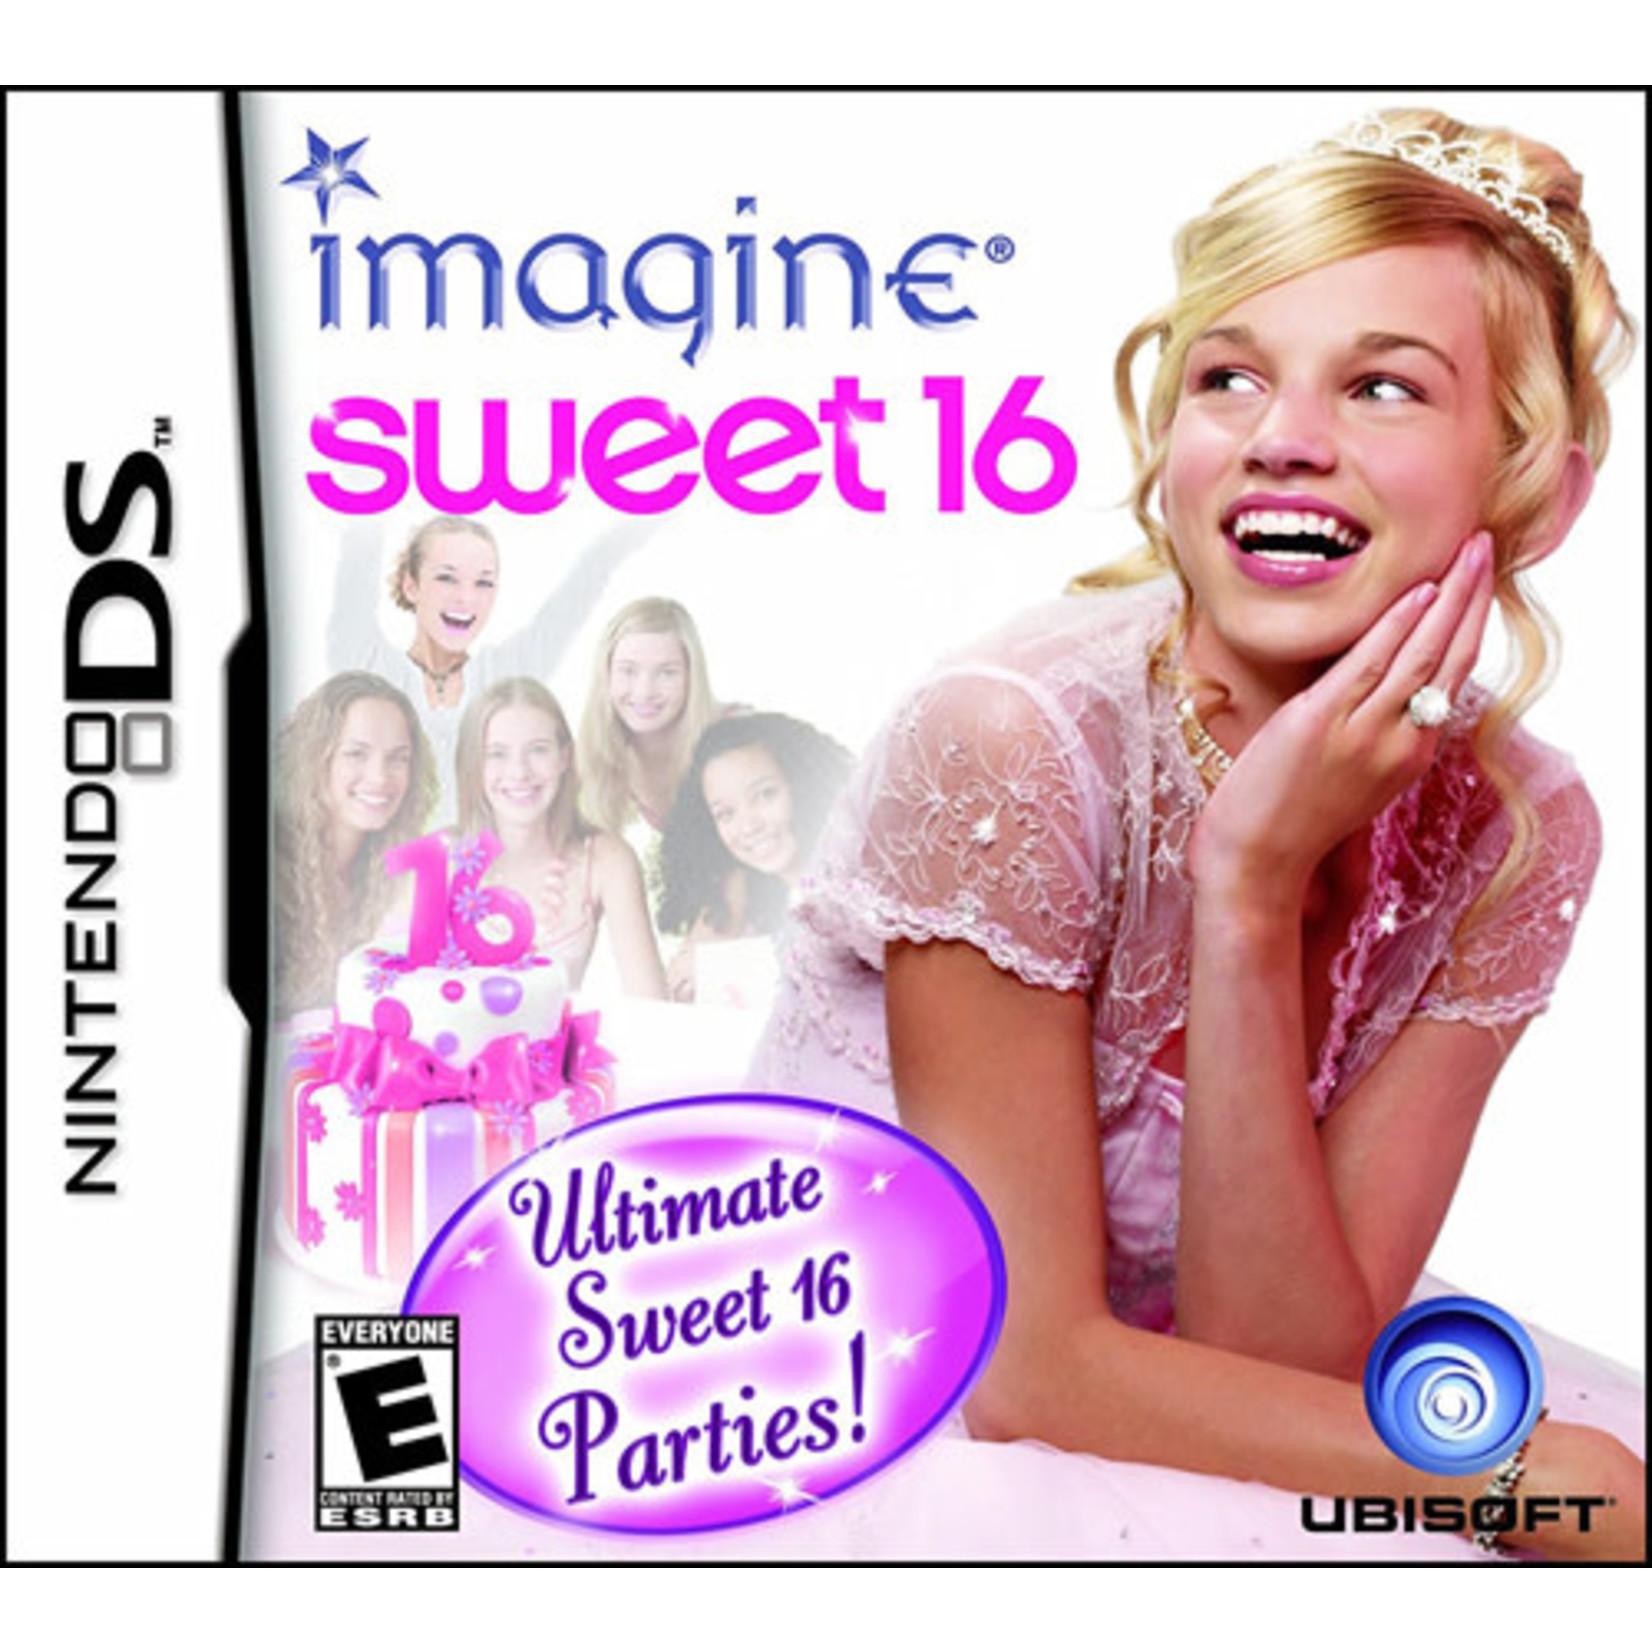 DS-IMAGINE SWEET 16